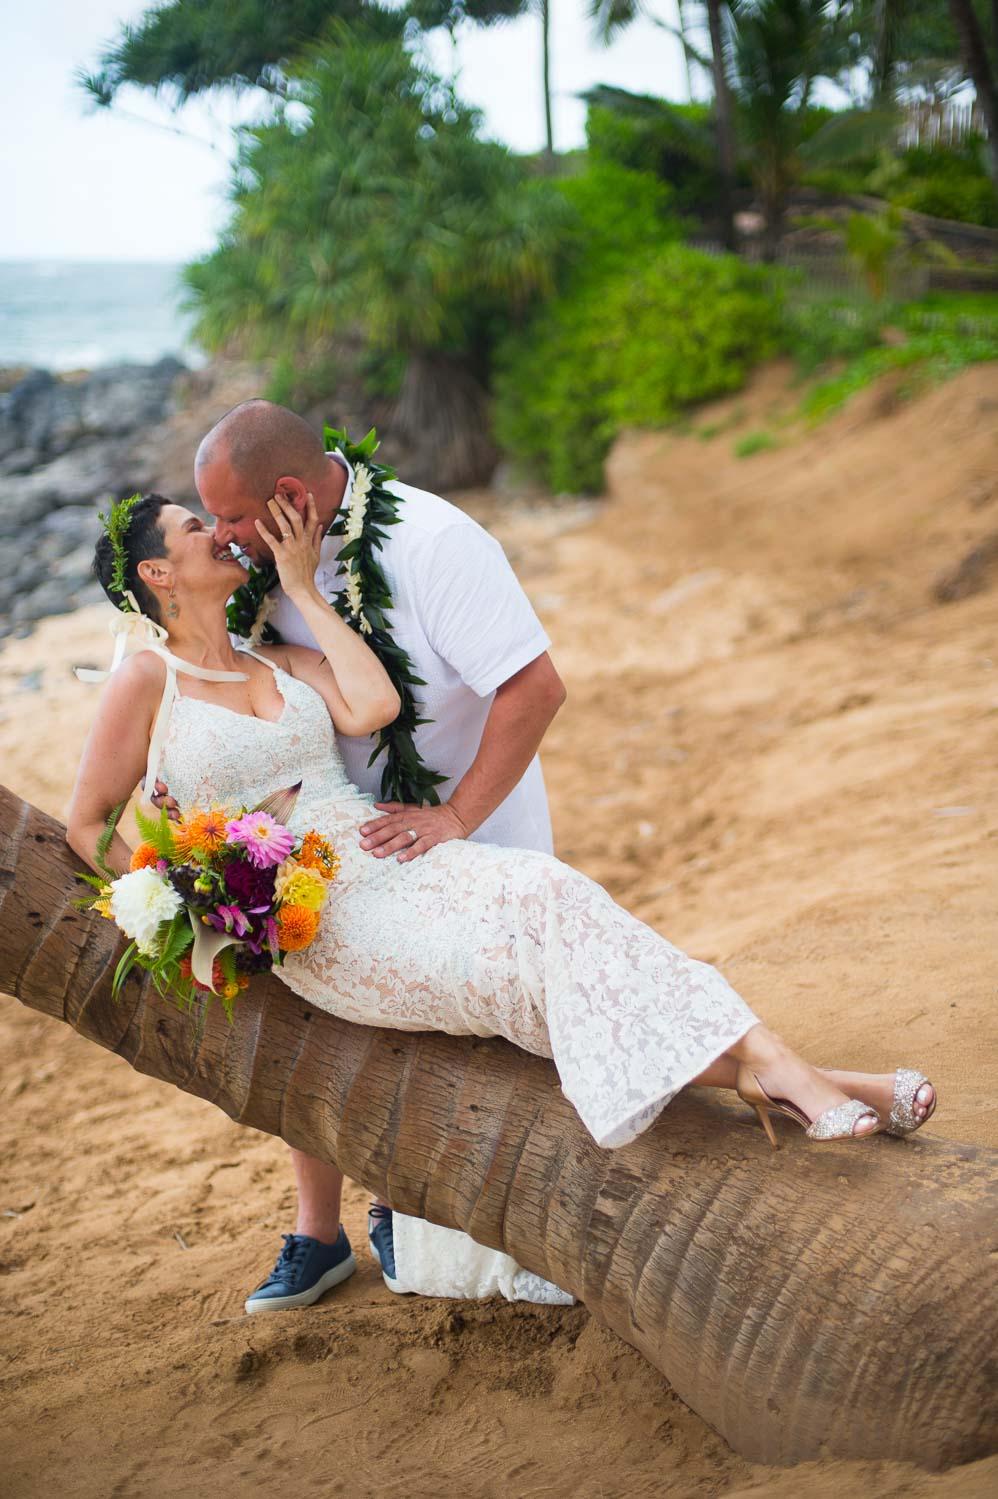 maui-wedding-photography-maui-wedding-venue-Tad-Craig-Photography-46.jpg